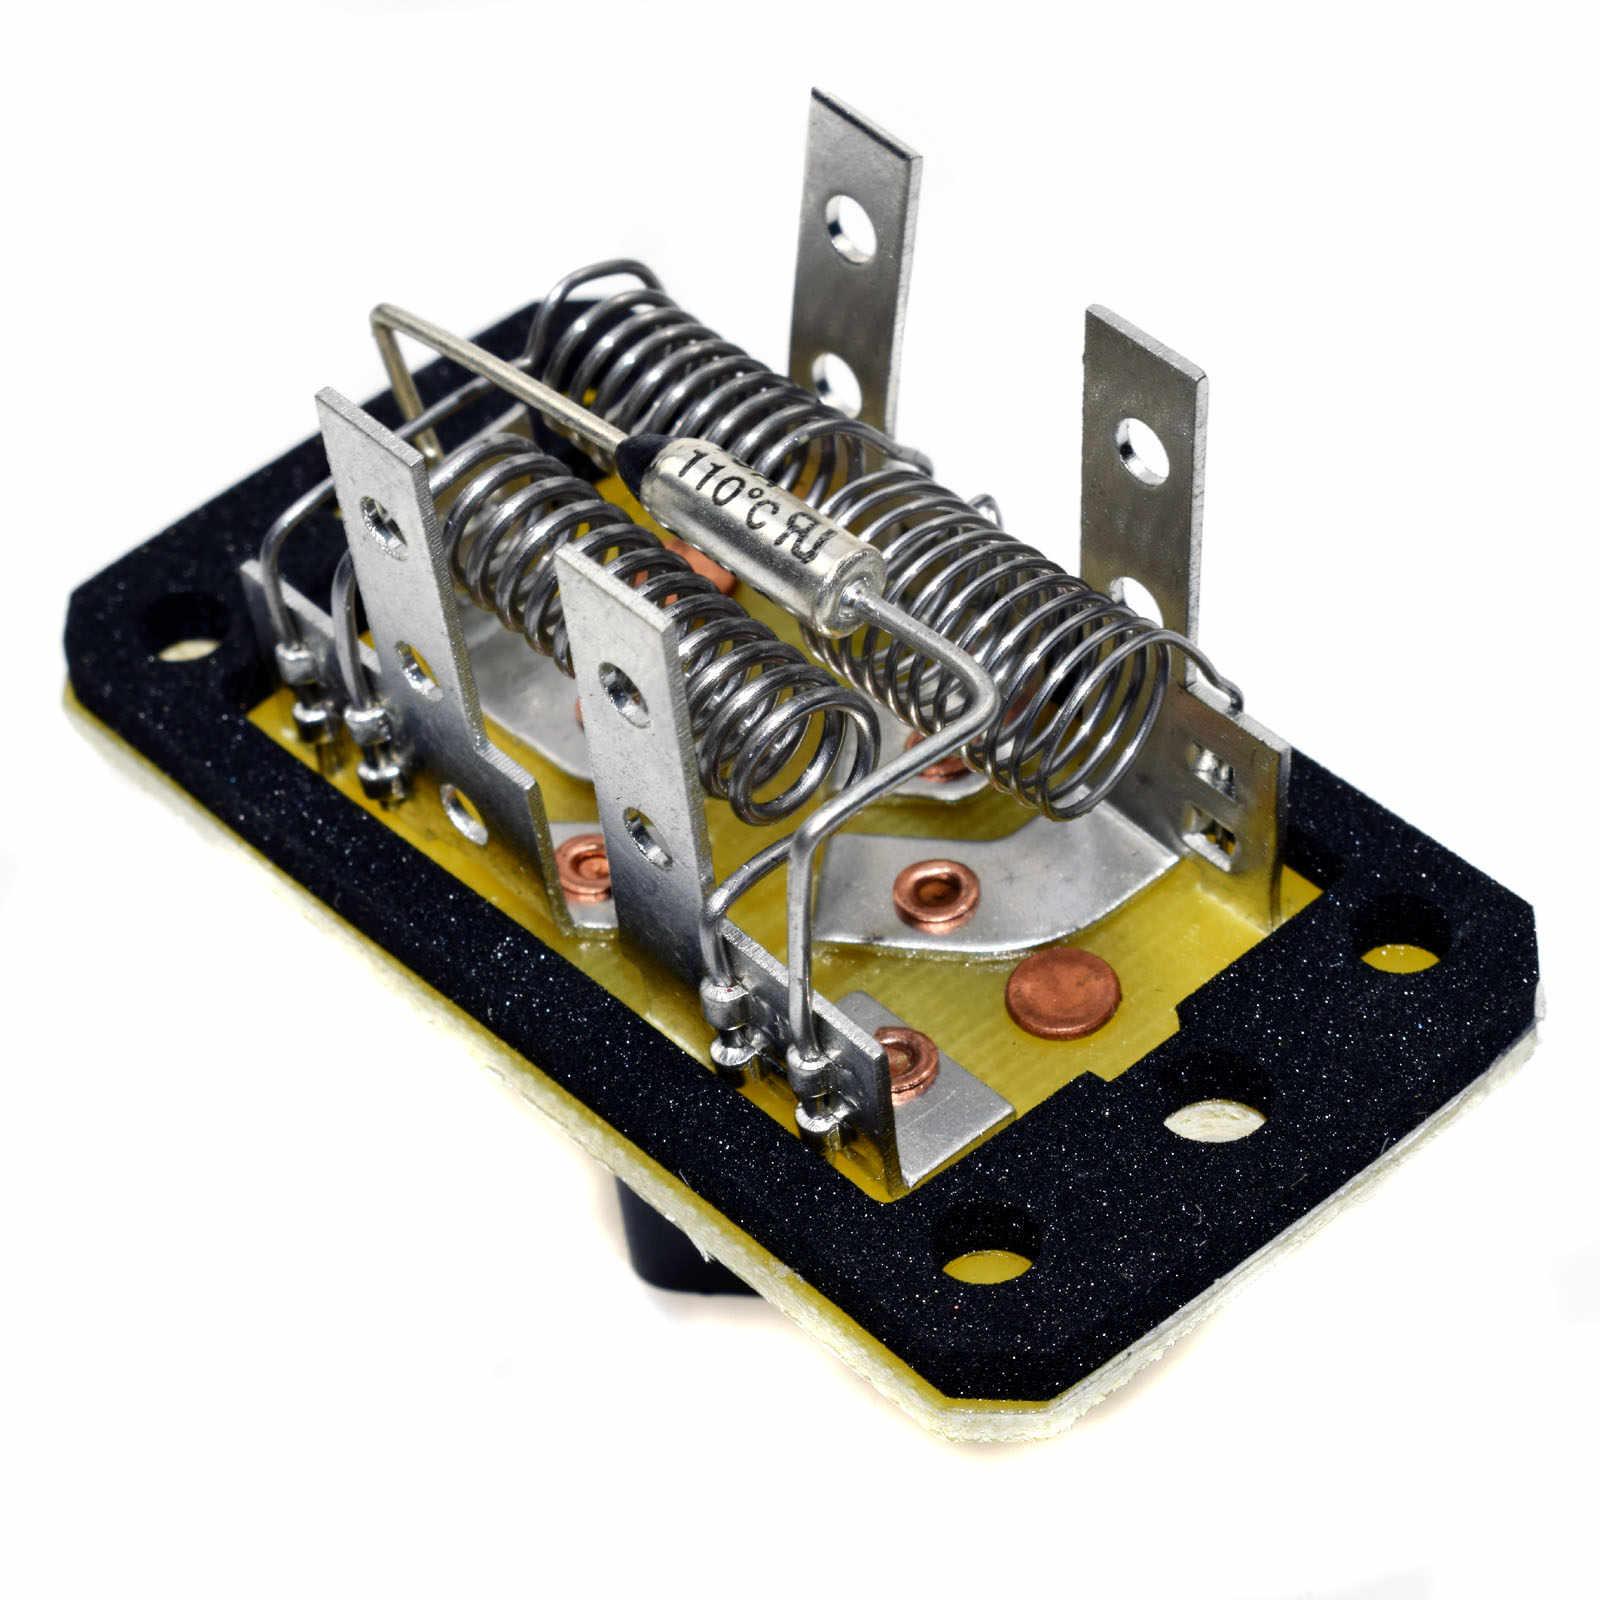 Wolfigo Heater Blower Motor Resistor For Ford Expedition Escape F 150 F 250 Ranger Mazda B3000 Mercury 4l3z19a706aa F4zz19a706a